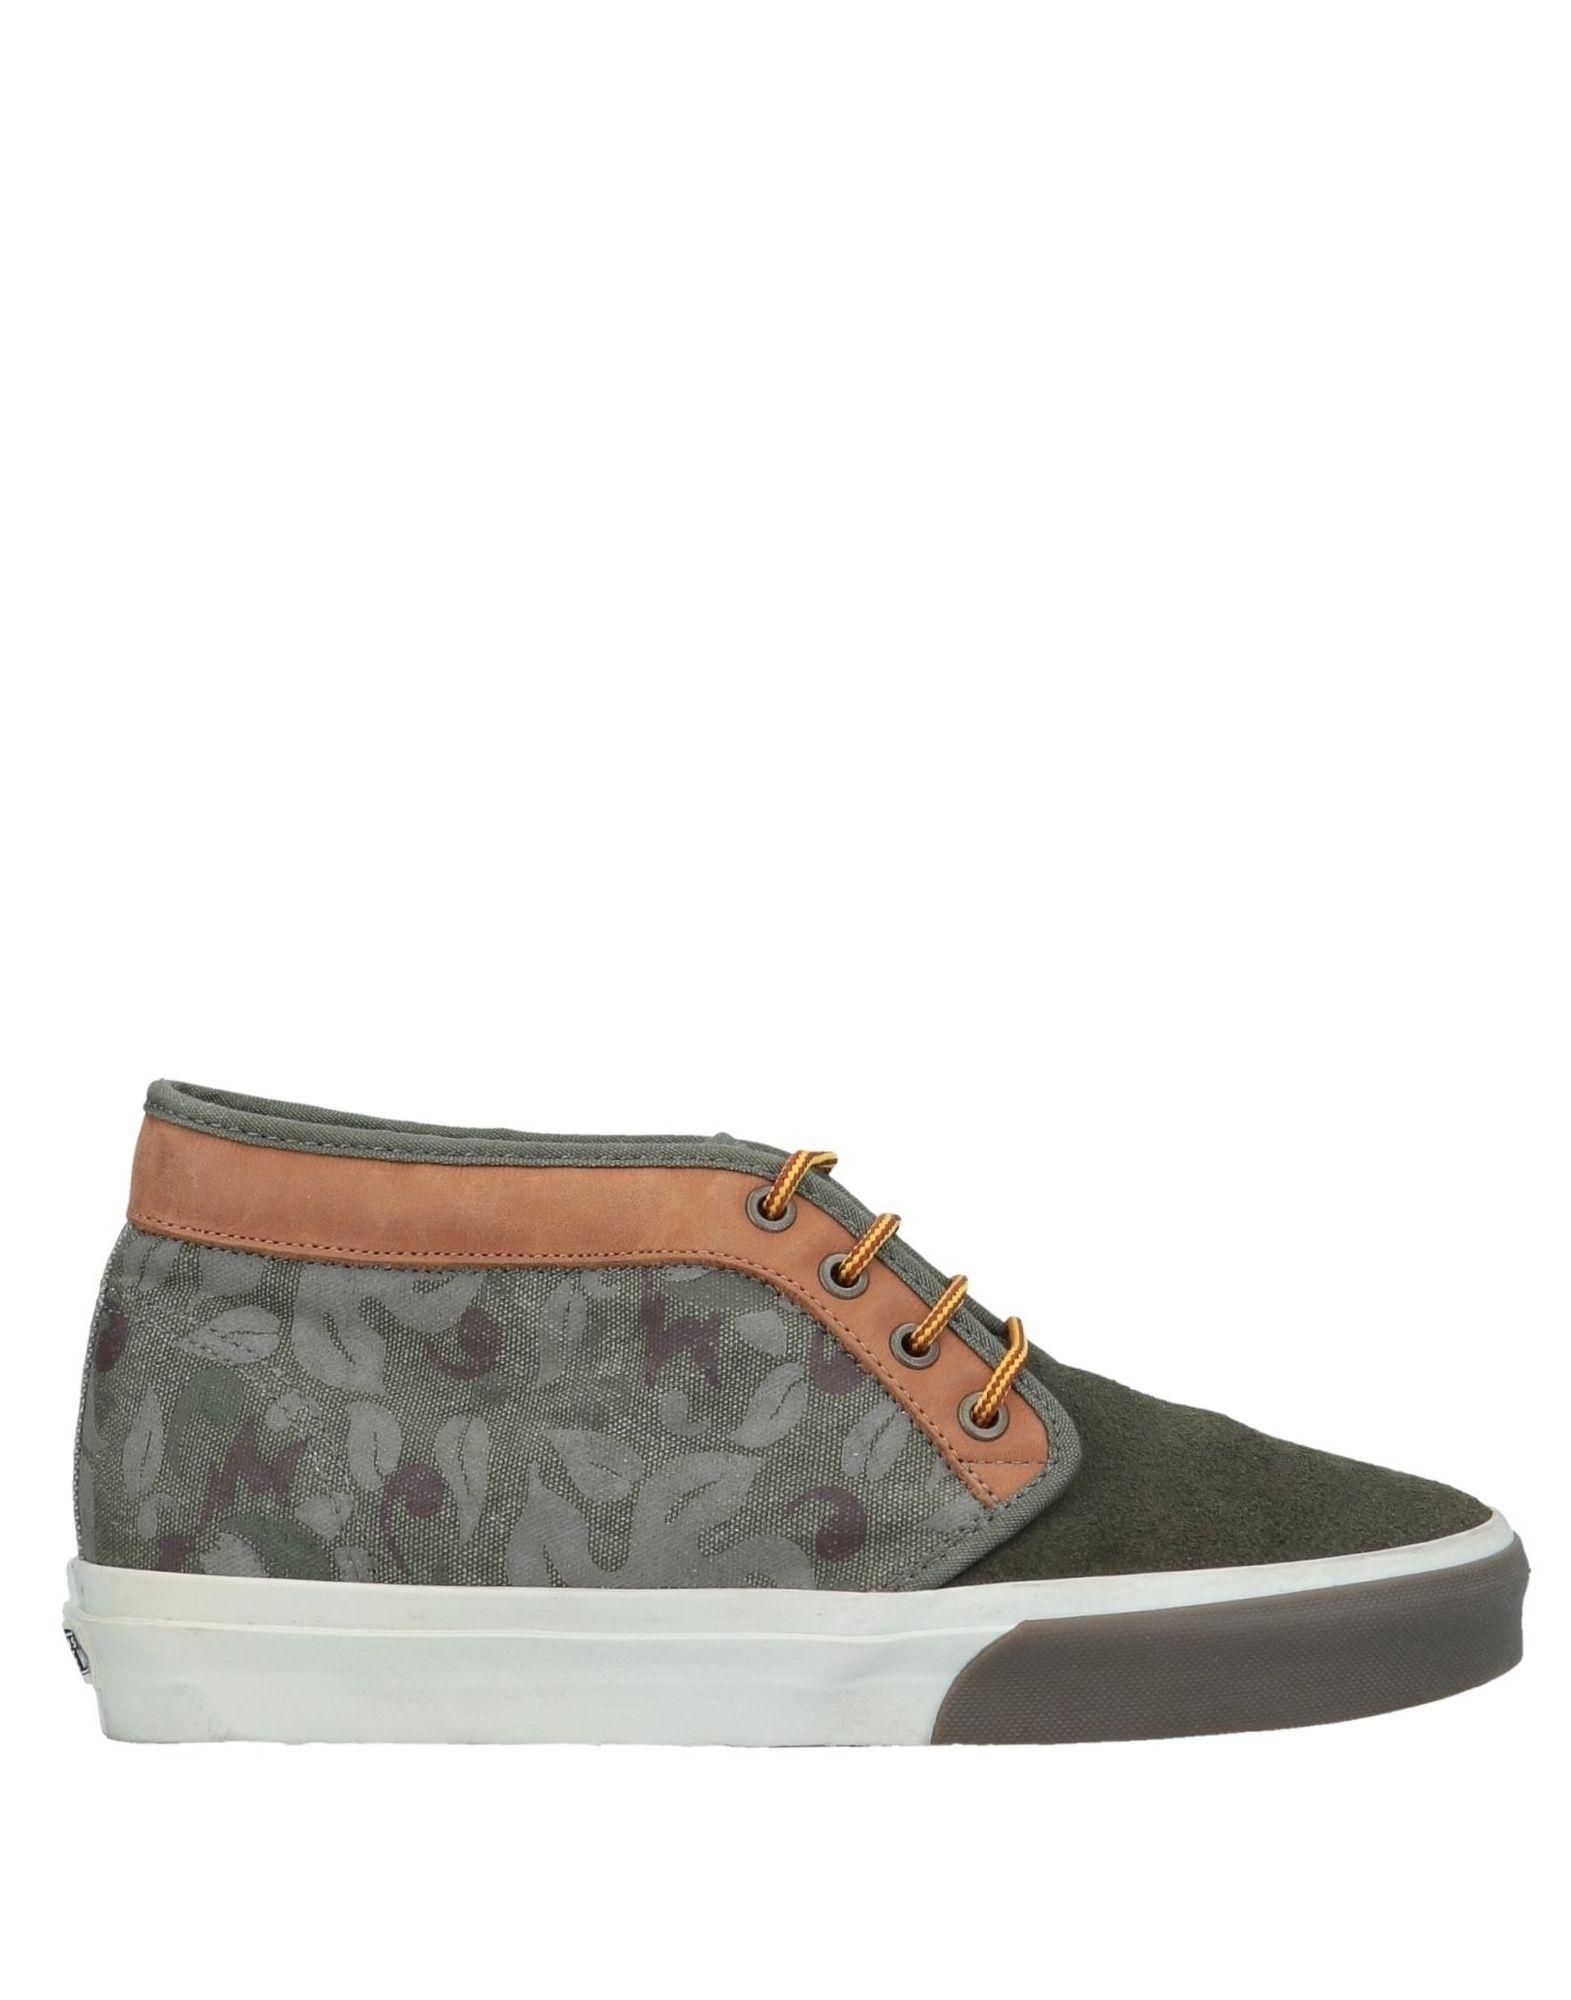 Vans California Sneakers Sneakers - Men Vans California Sneakers Sneakers online on  Canada - 11578927WF 427983